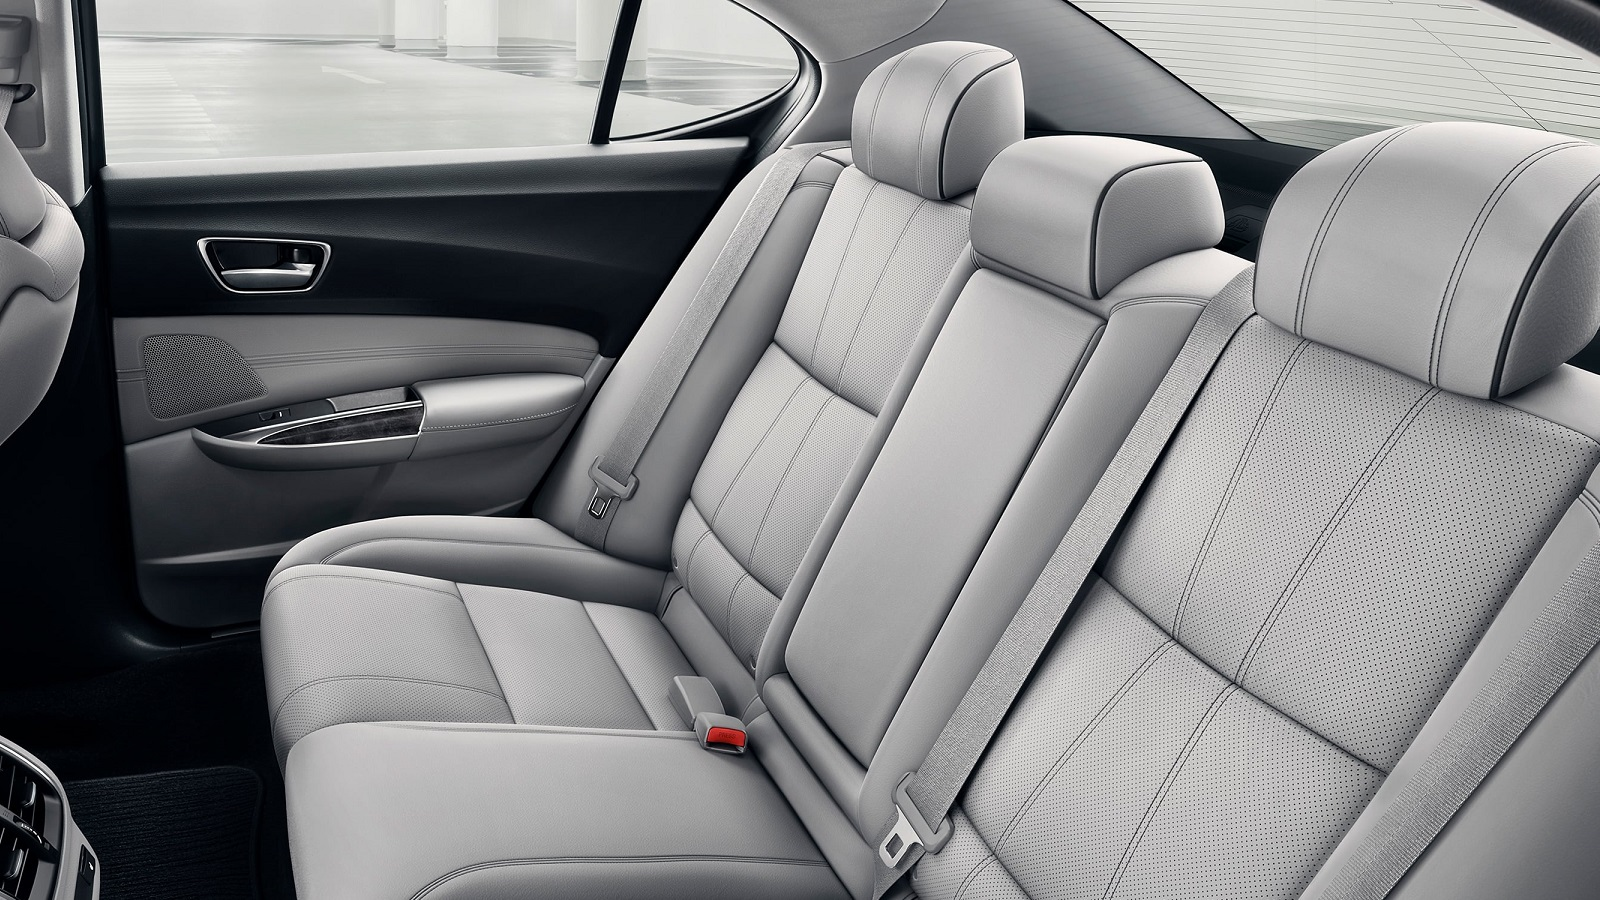 2020 Acura TLX Second Row